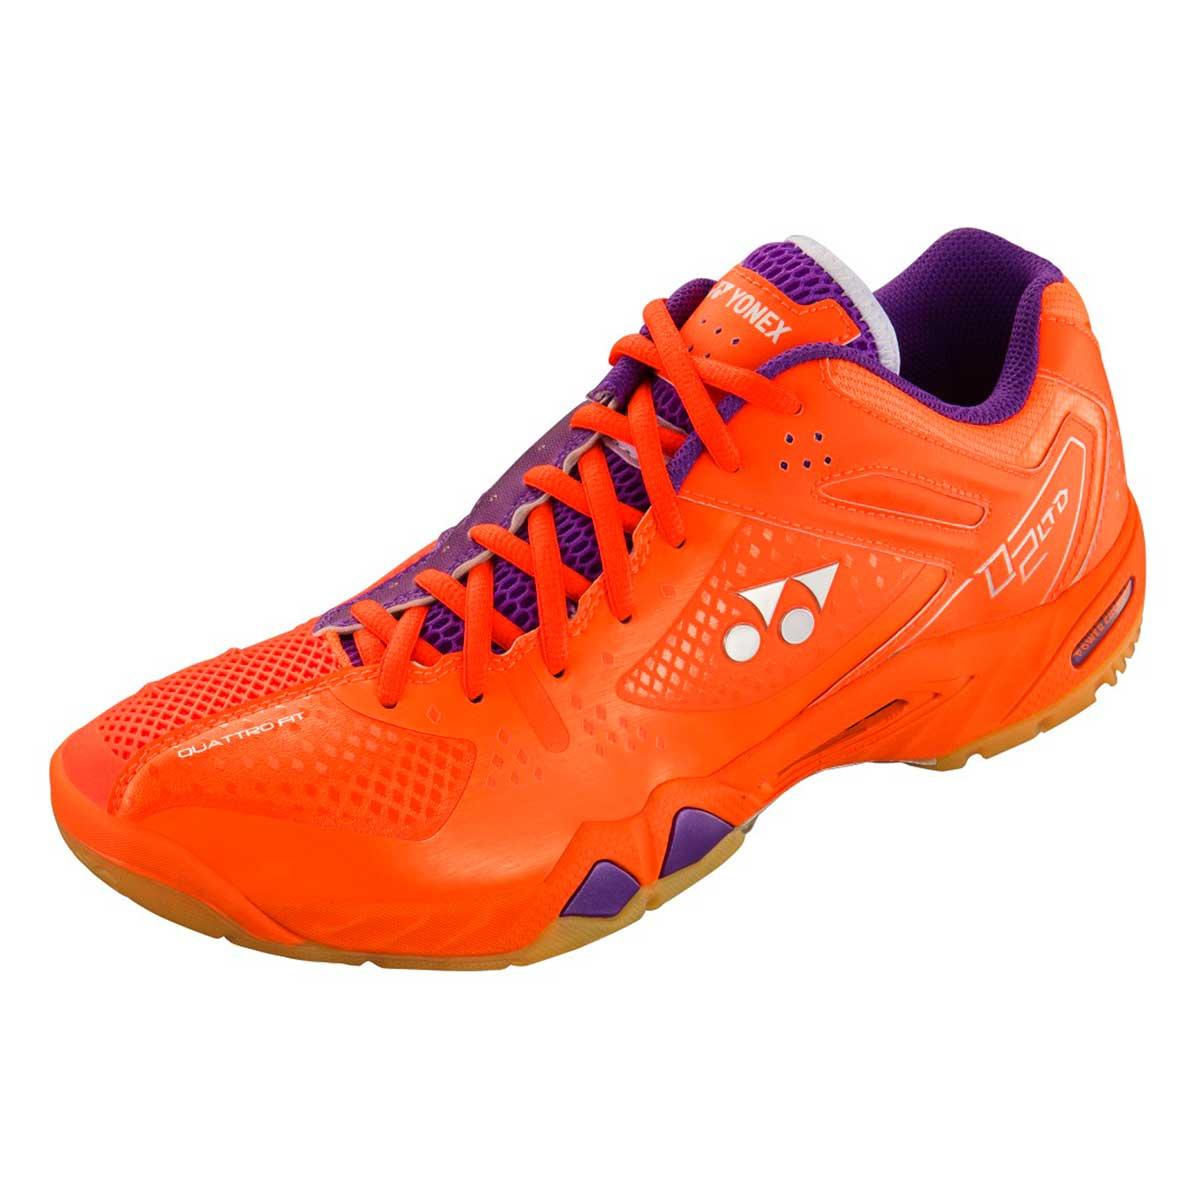 Buy YONEX SHB 02 LTD Badminton Shoes (Bright Orange ...